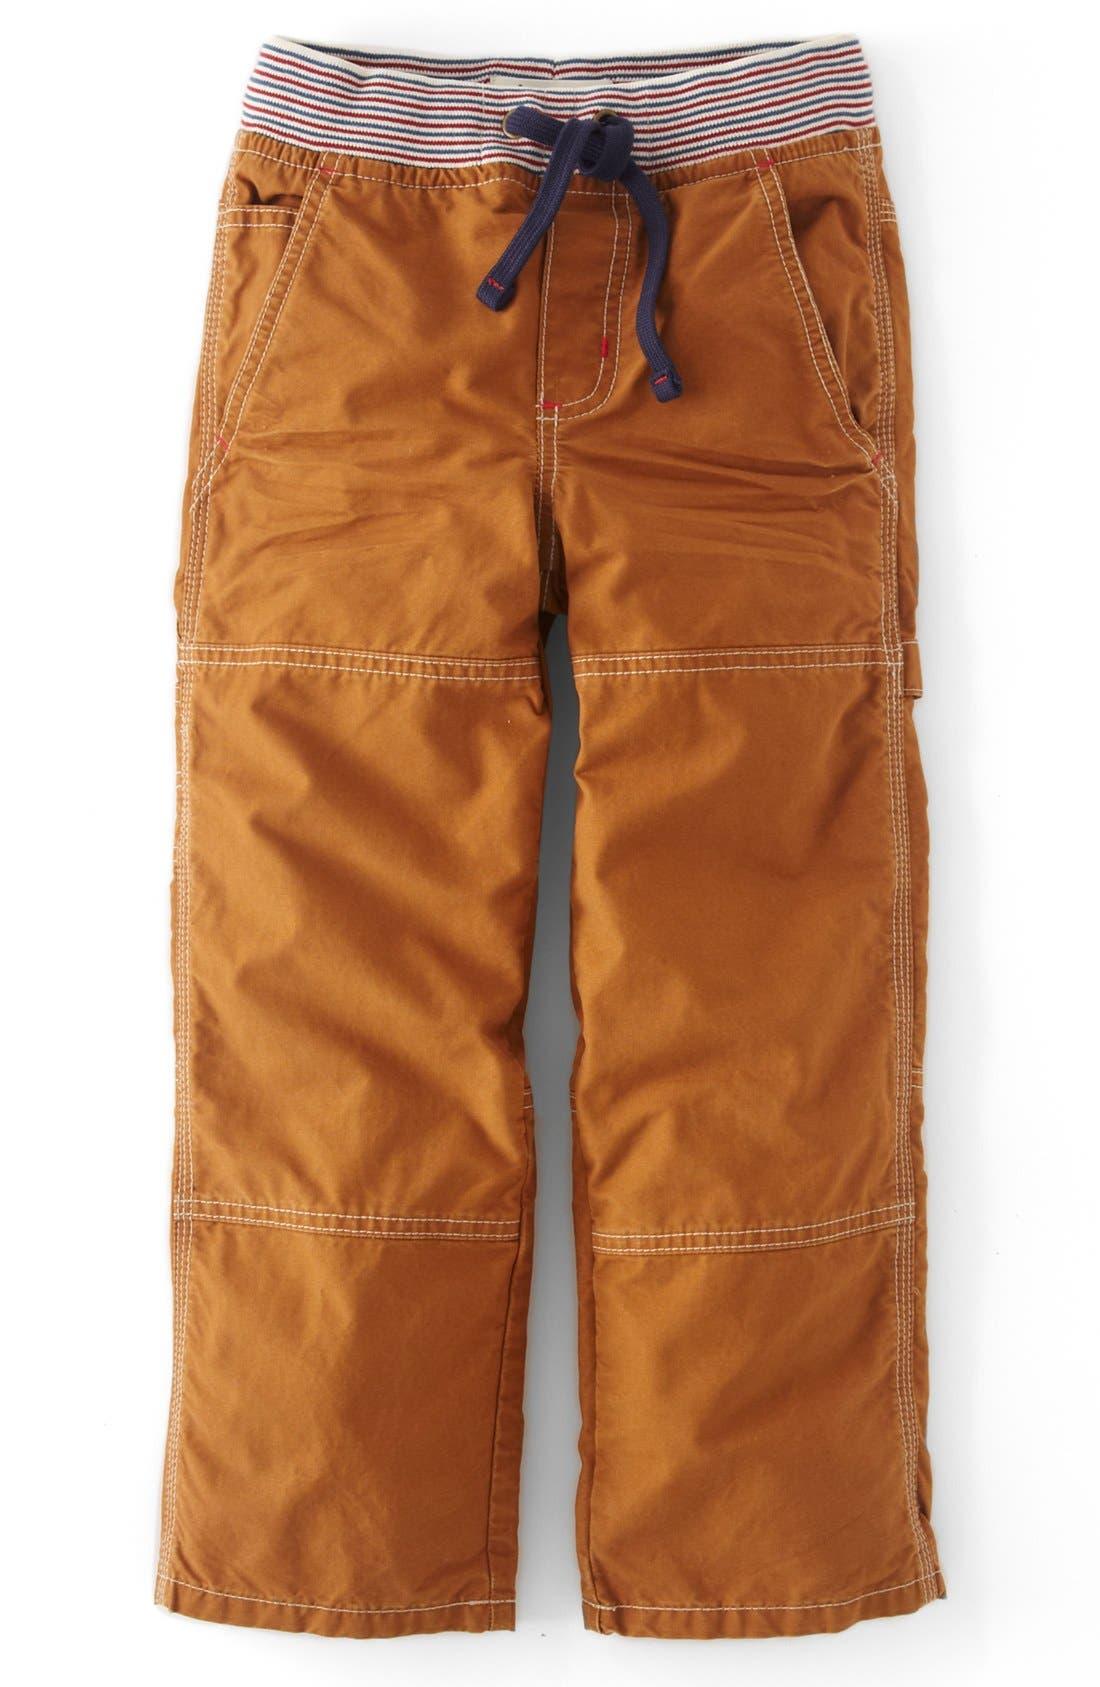 Alternate Image 1 Selected - Mini Boden Carpenter Pants (Toddler Boys, Little Boys & Big Boys)